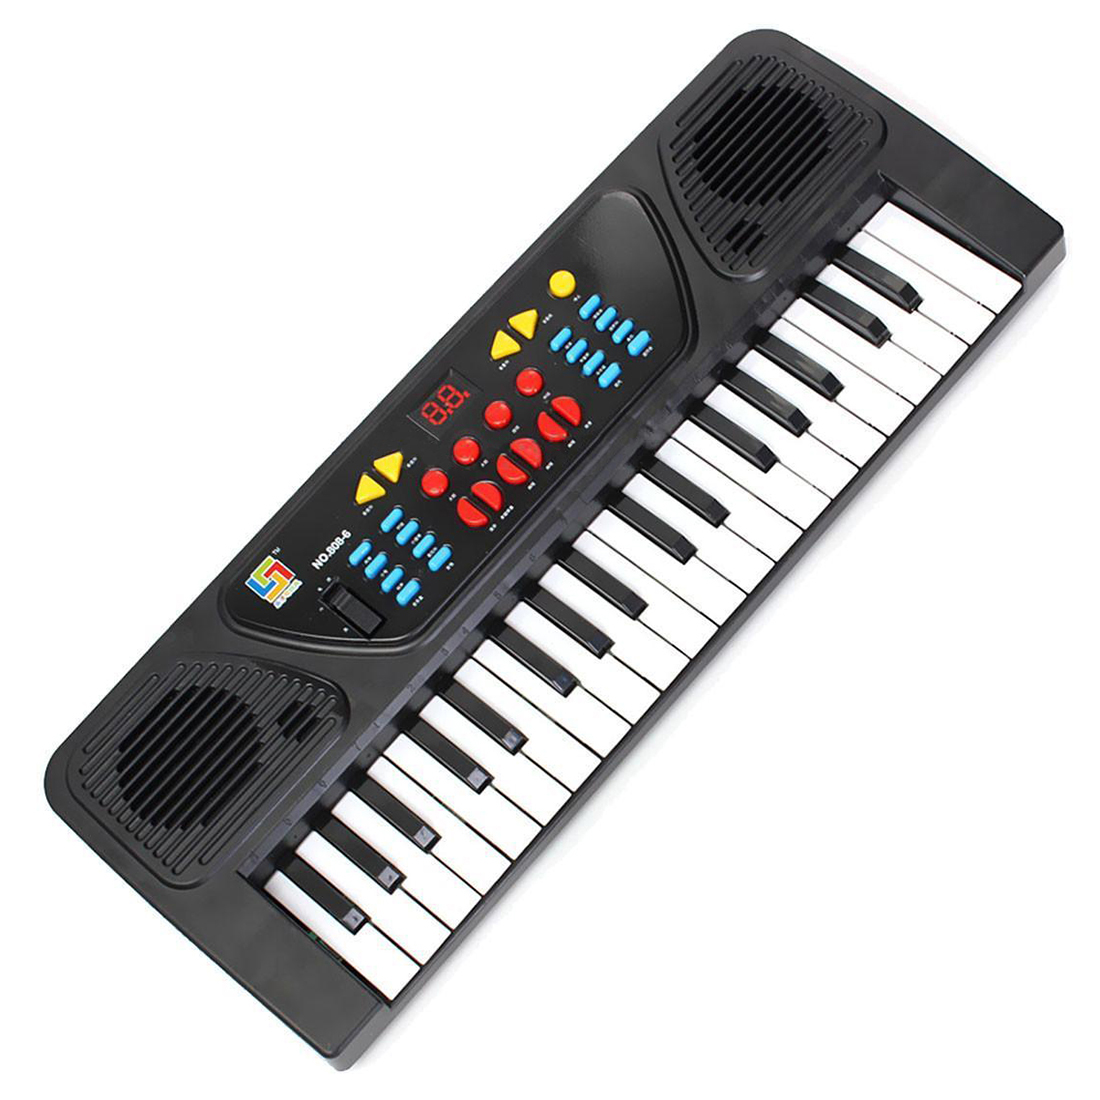 Kids Children 37 Key Electronic Keyboard Piano Musical Toy Record Microphone Mic, Black+WhiteKids Children 37 Key Electronic Keyboard Piano Musical Toy Record Microphone Mic, Black+White